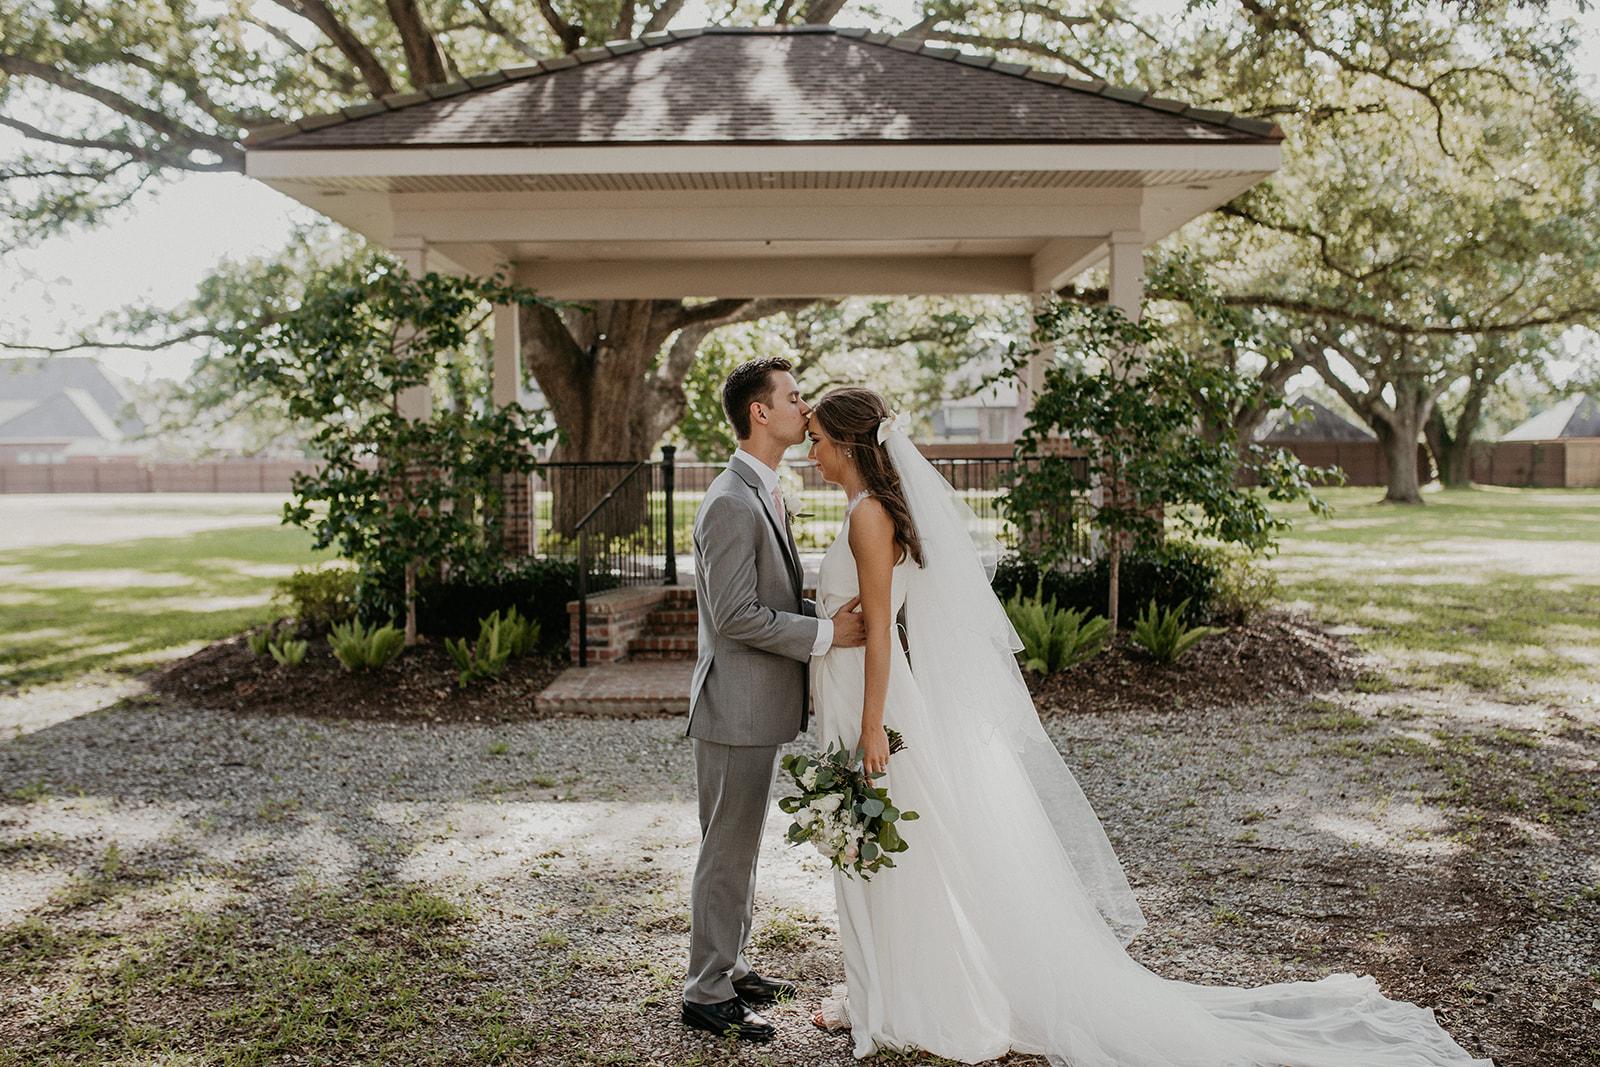 Wedding Photos at the Gazebo